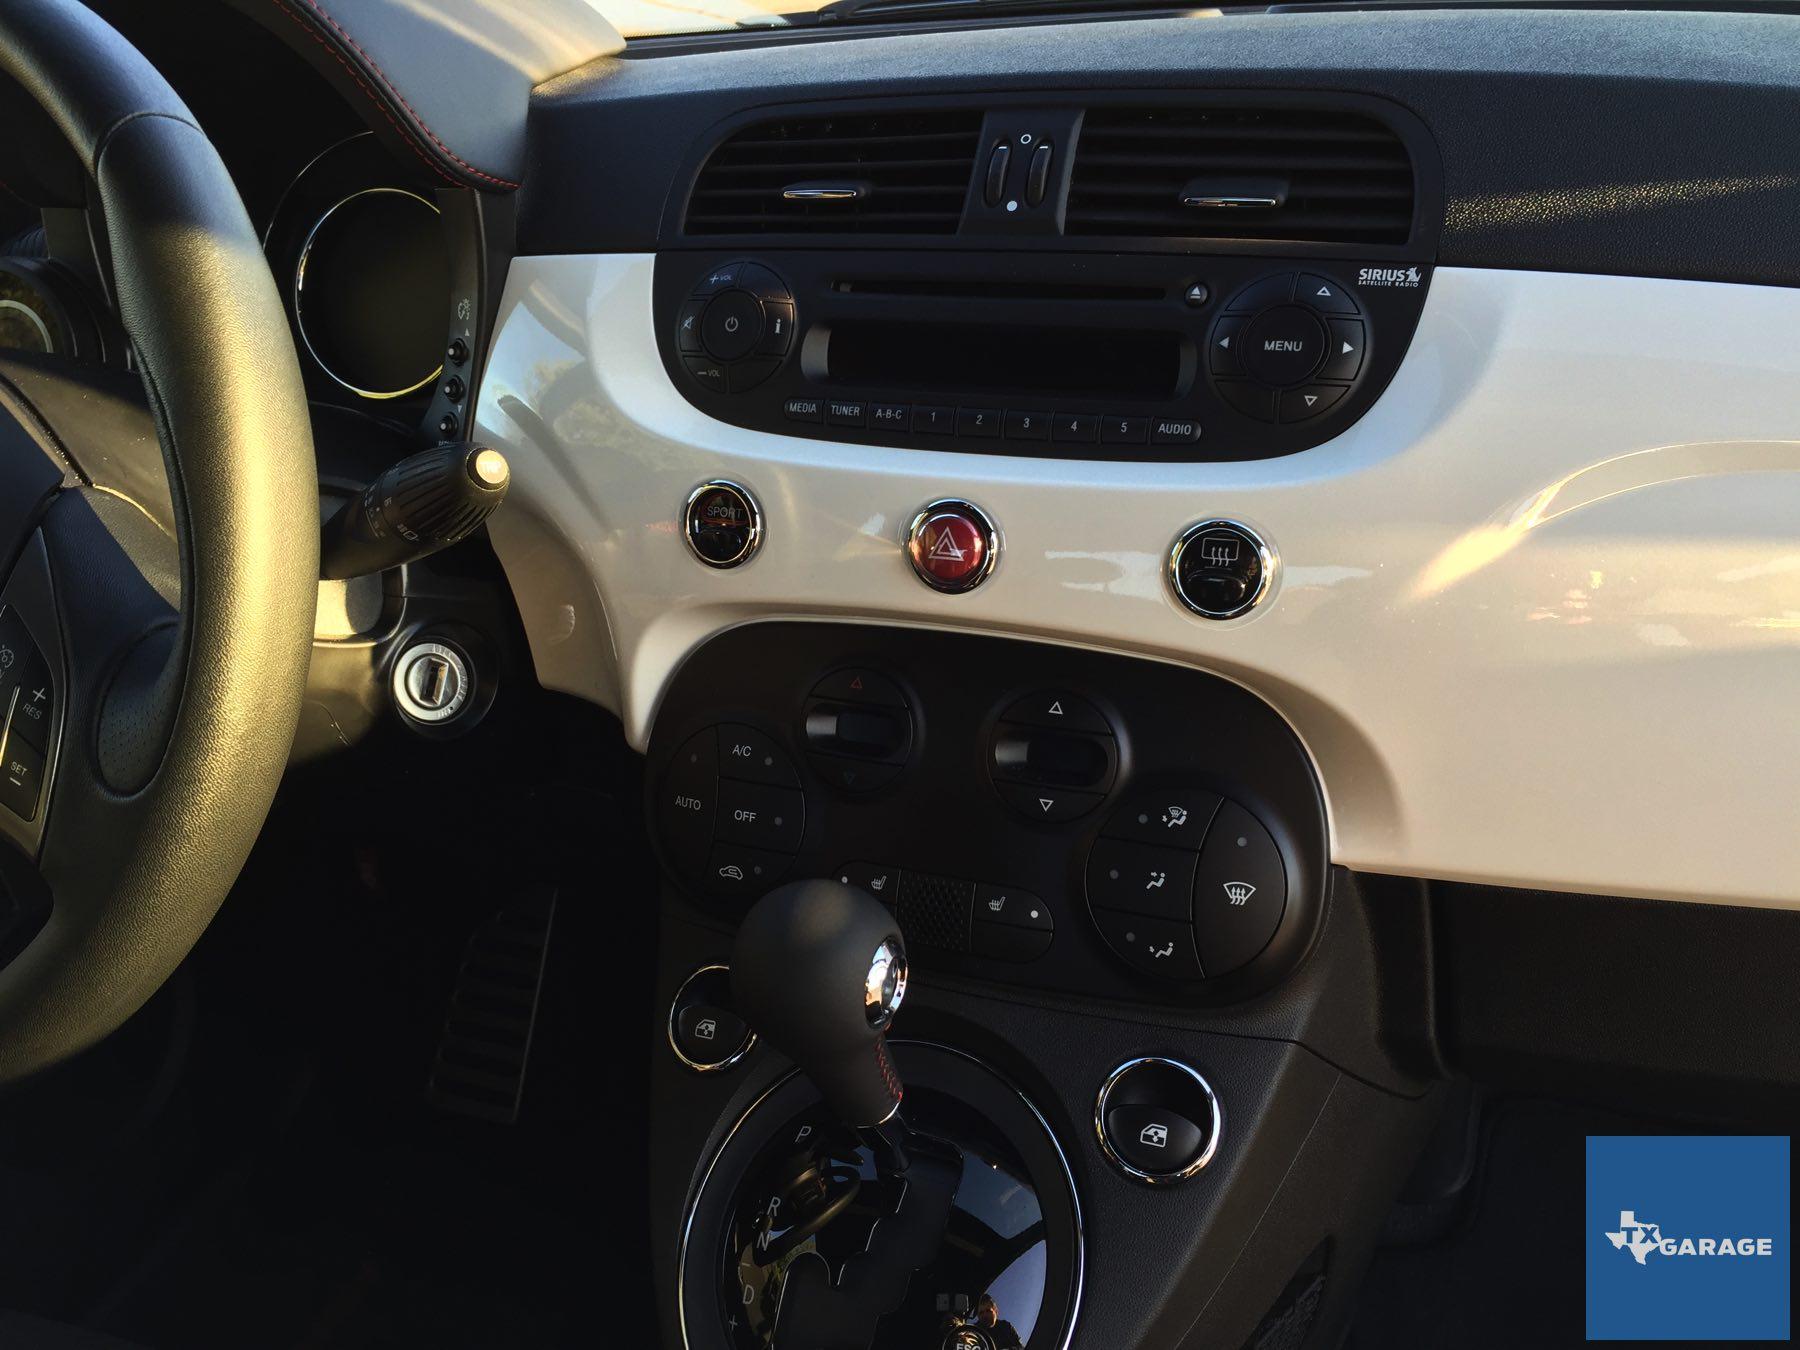 2015-Fiat-500-Abarth-txGarage-045